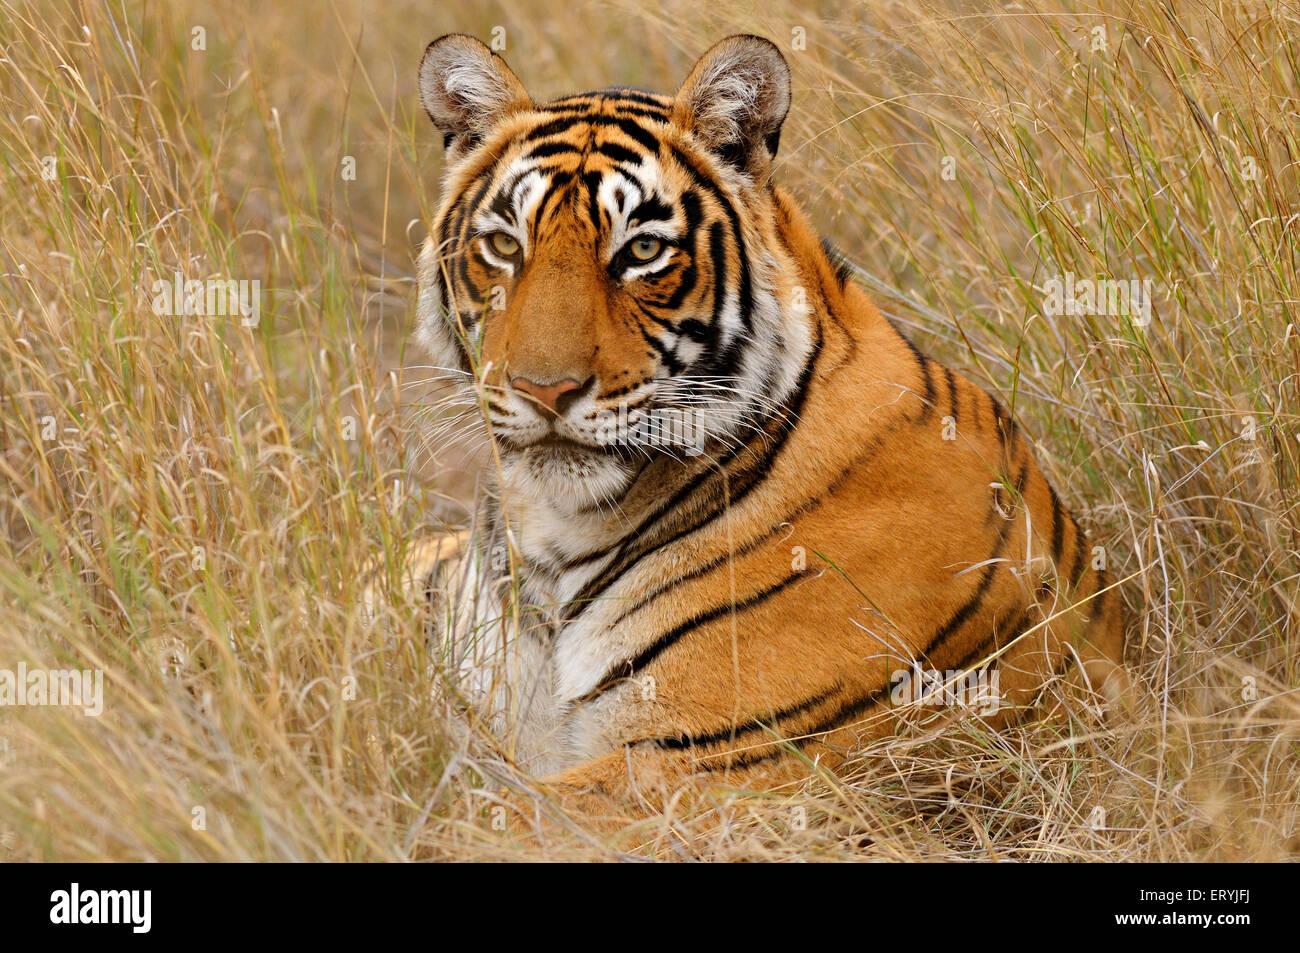 Tiger panthera tigris tigris in seduta erbe secche ; Parco nazionale di Ranthambore ; Rajasthan ; India Immagini Stock